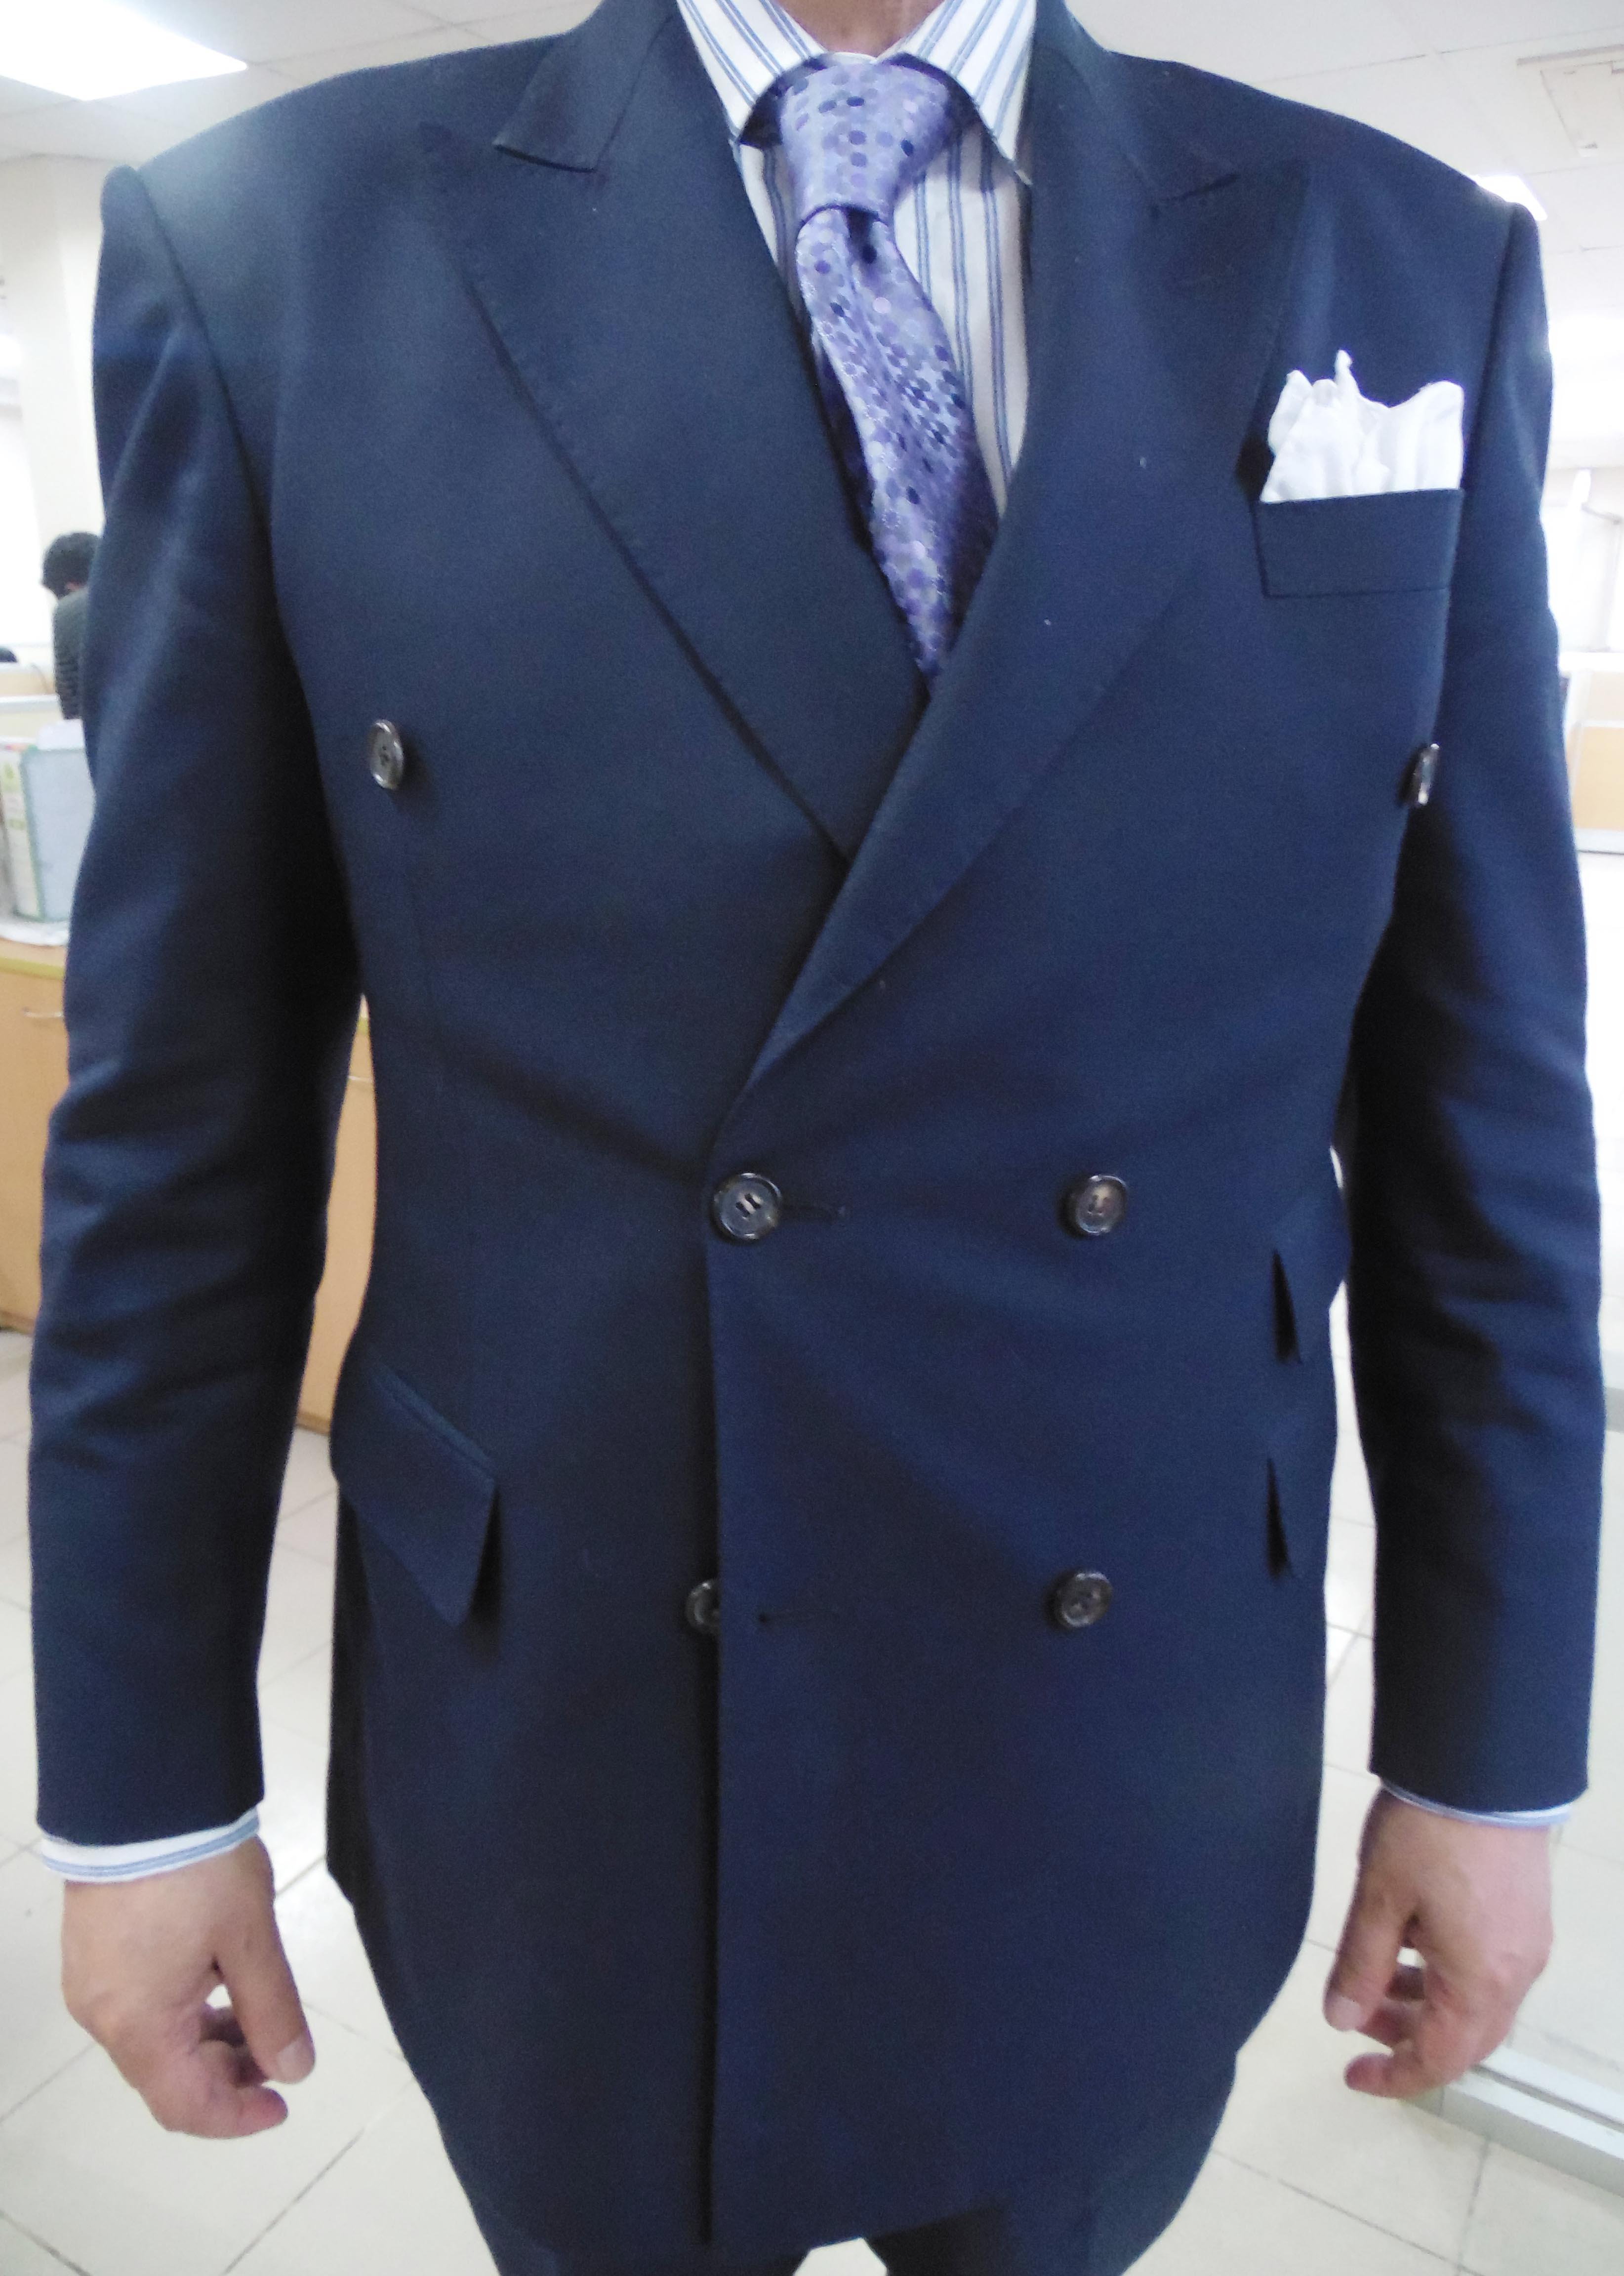 mediumweight woolen blue doublebreasted suit whiteblue